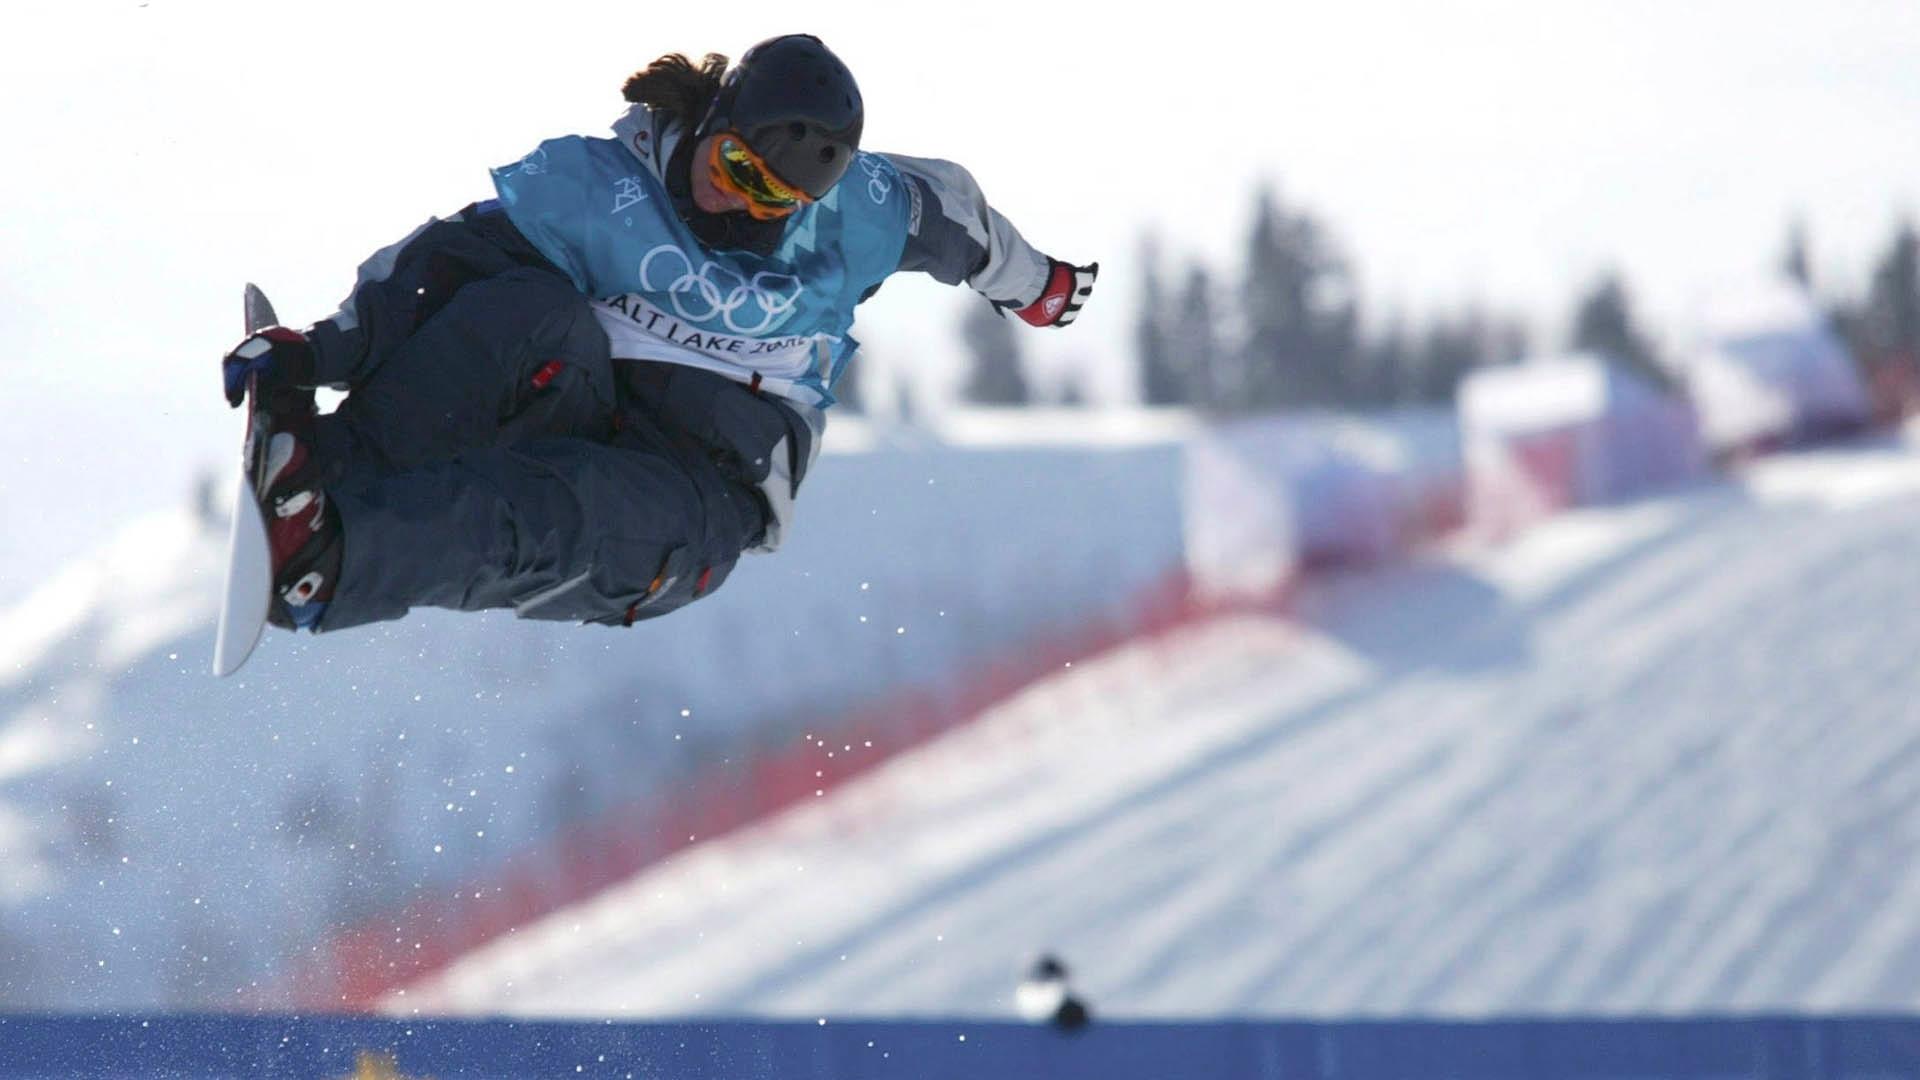 U.S. snowboarder Kelly Clark